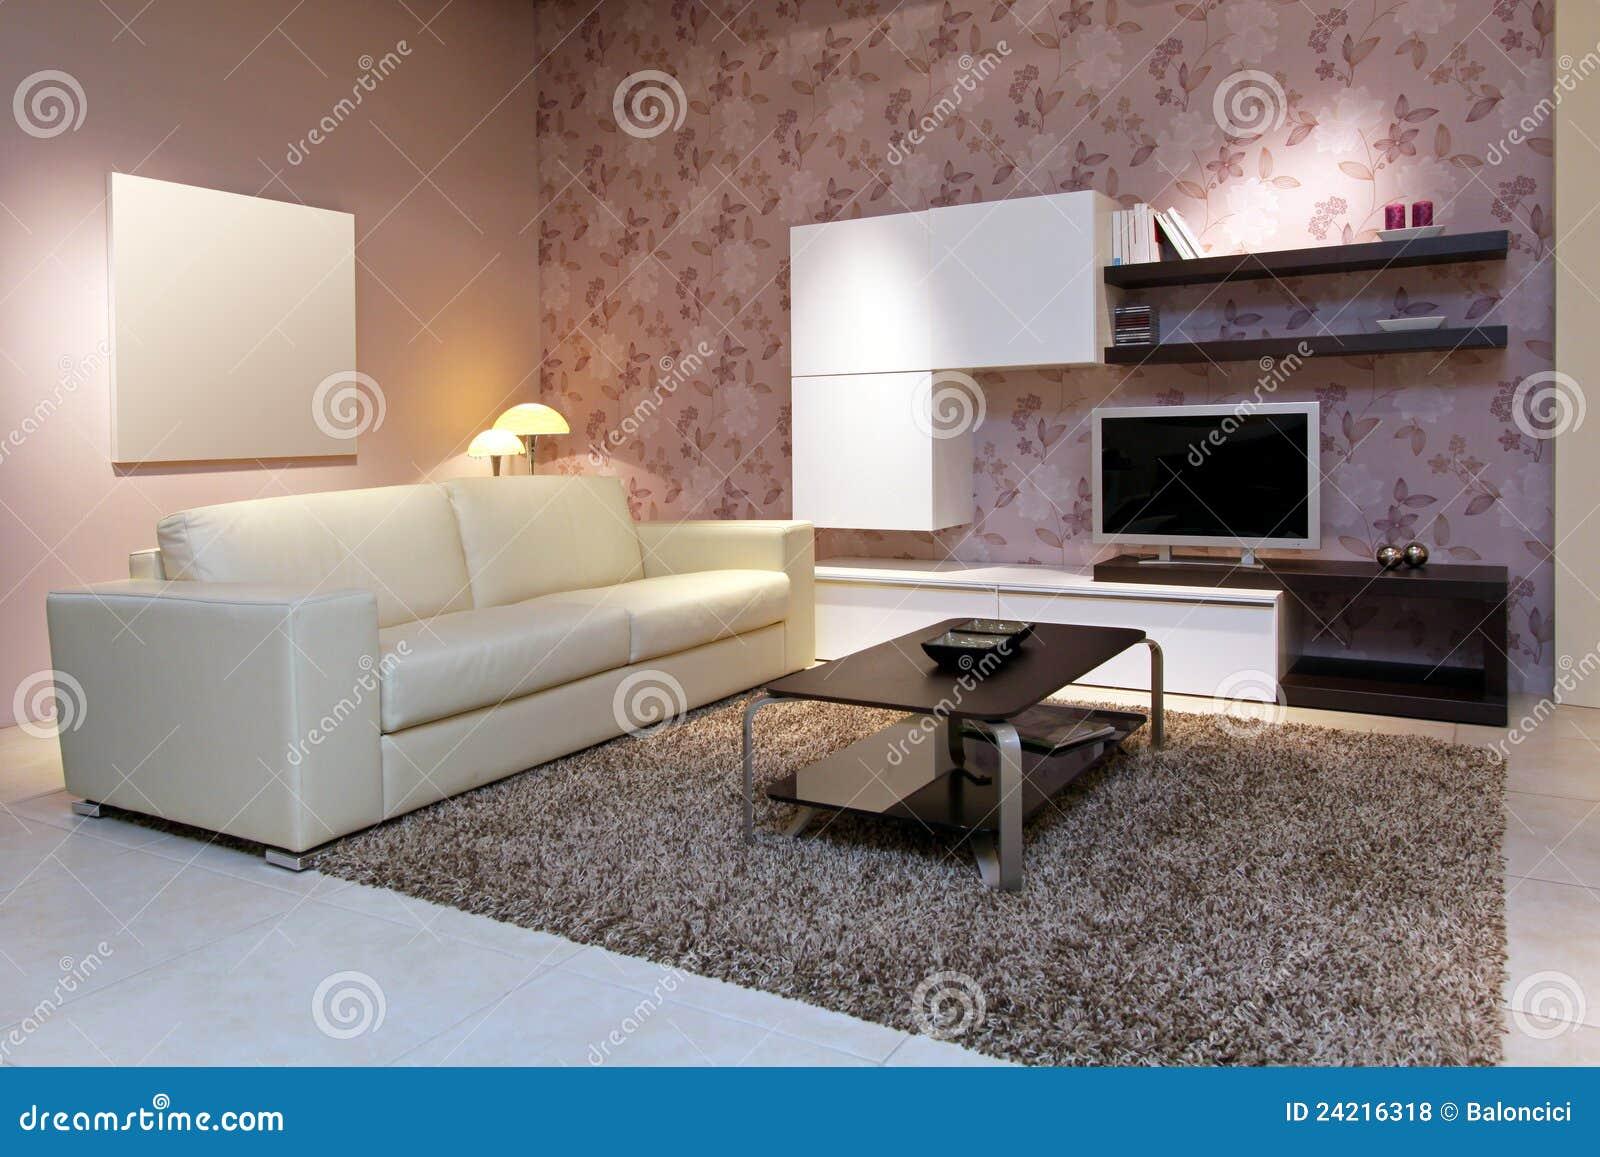 Roze decoratie woonkamer